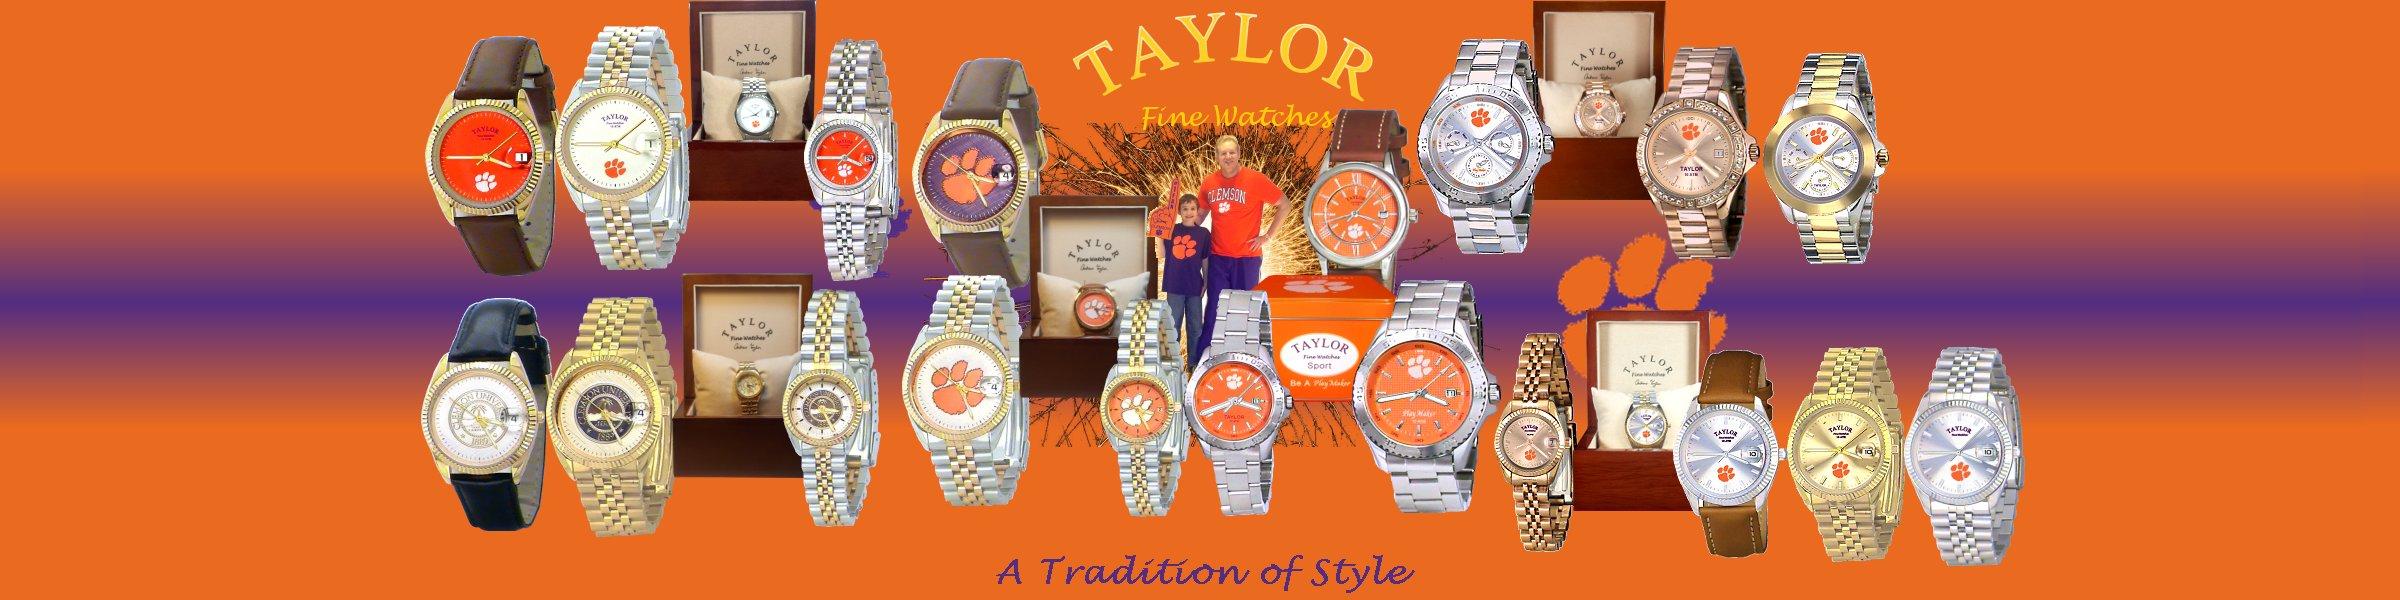 Clemson University Watches